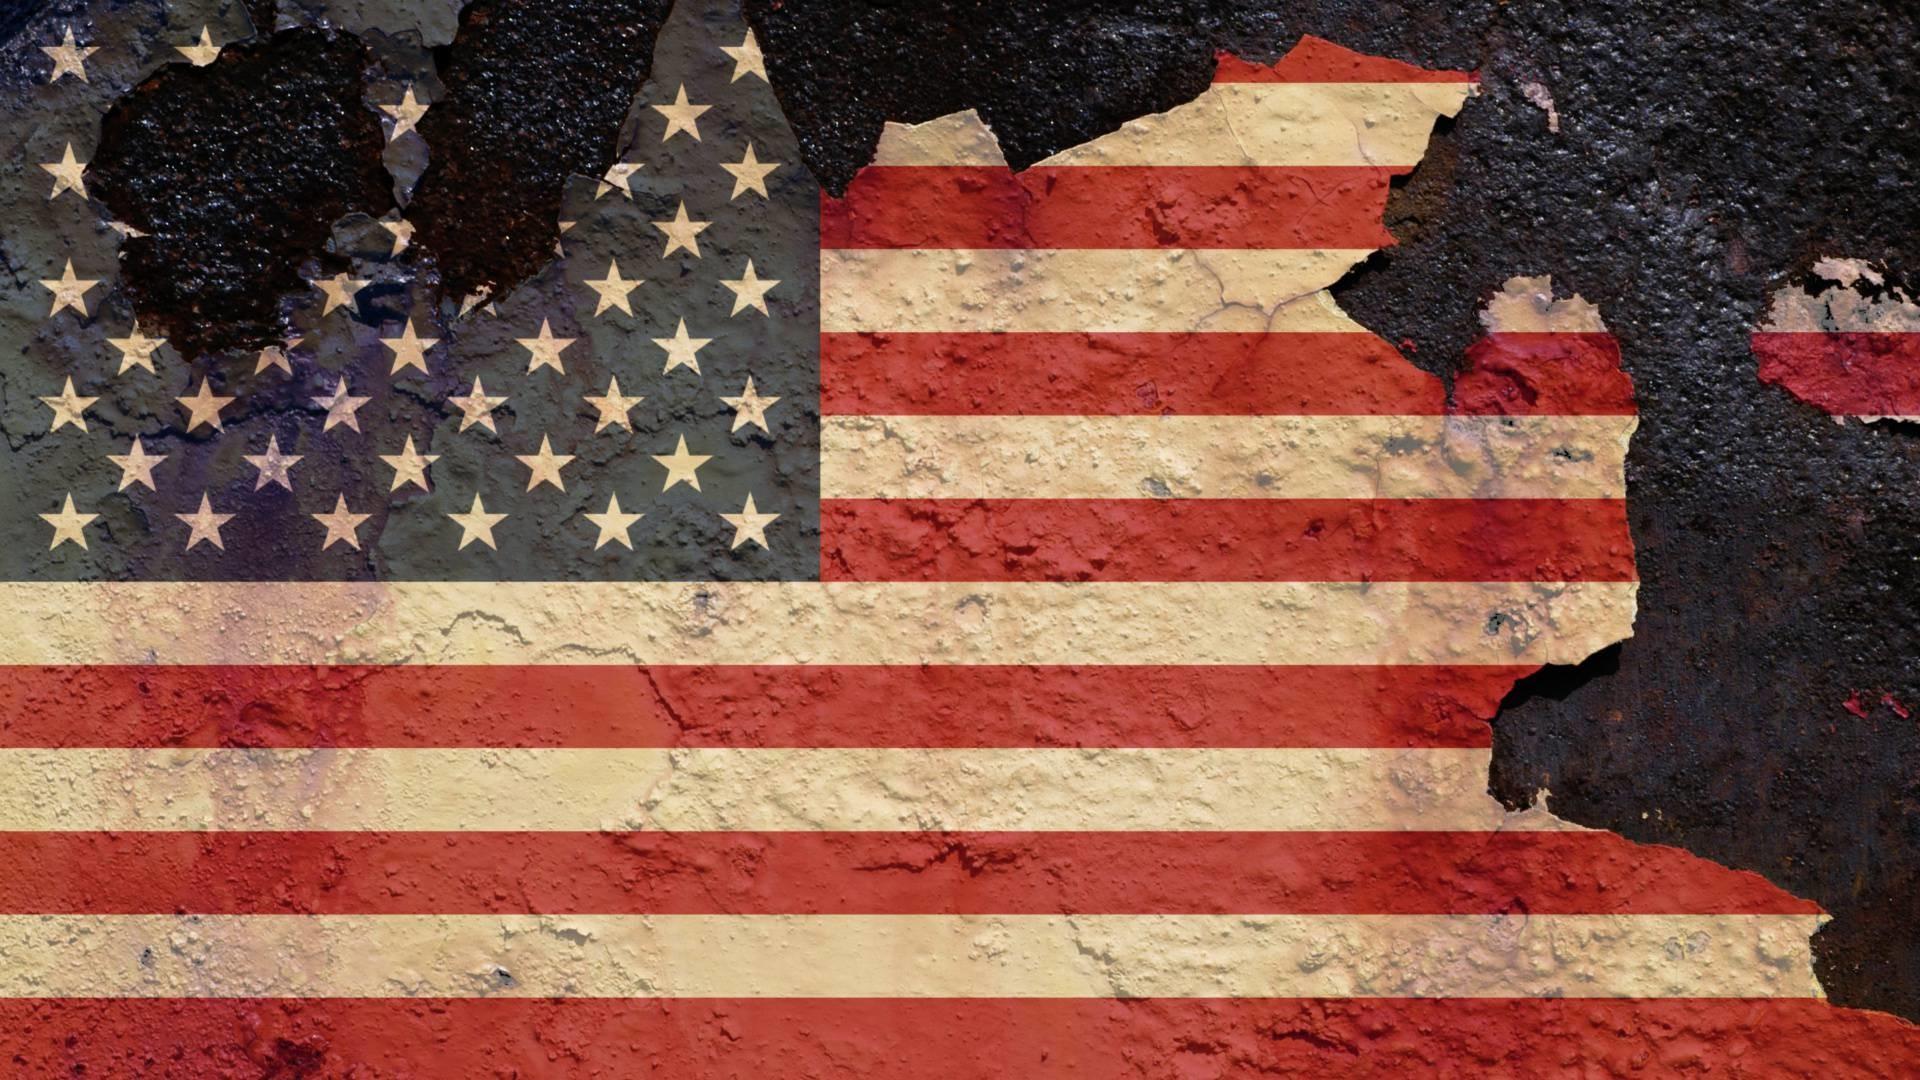 Page 1197 | Hd wallpaper image usa american flag free .